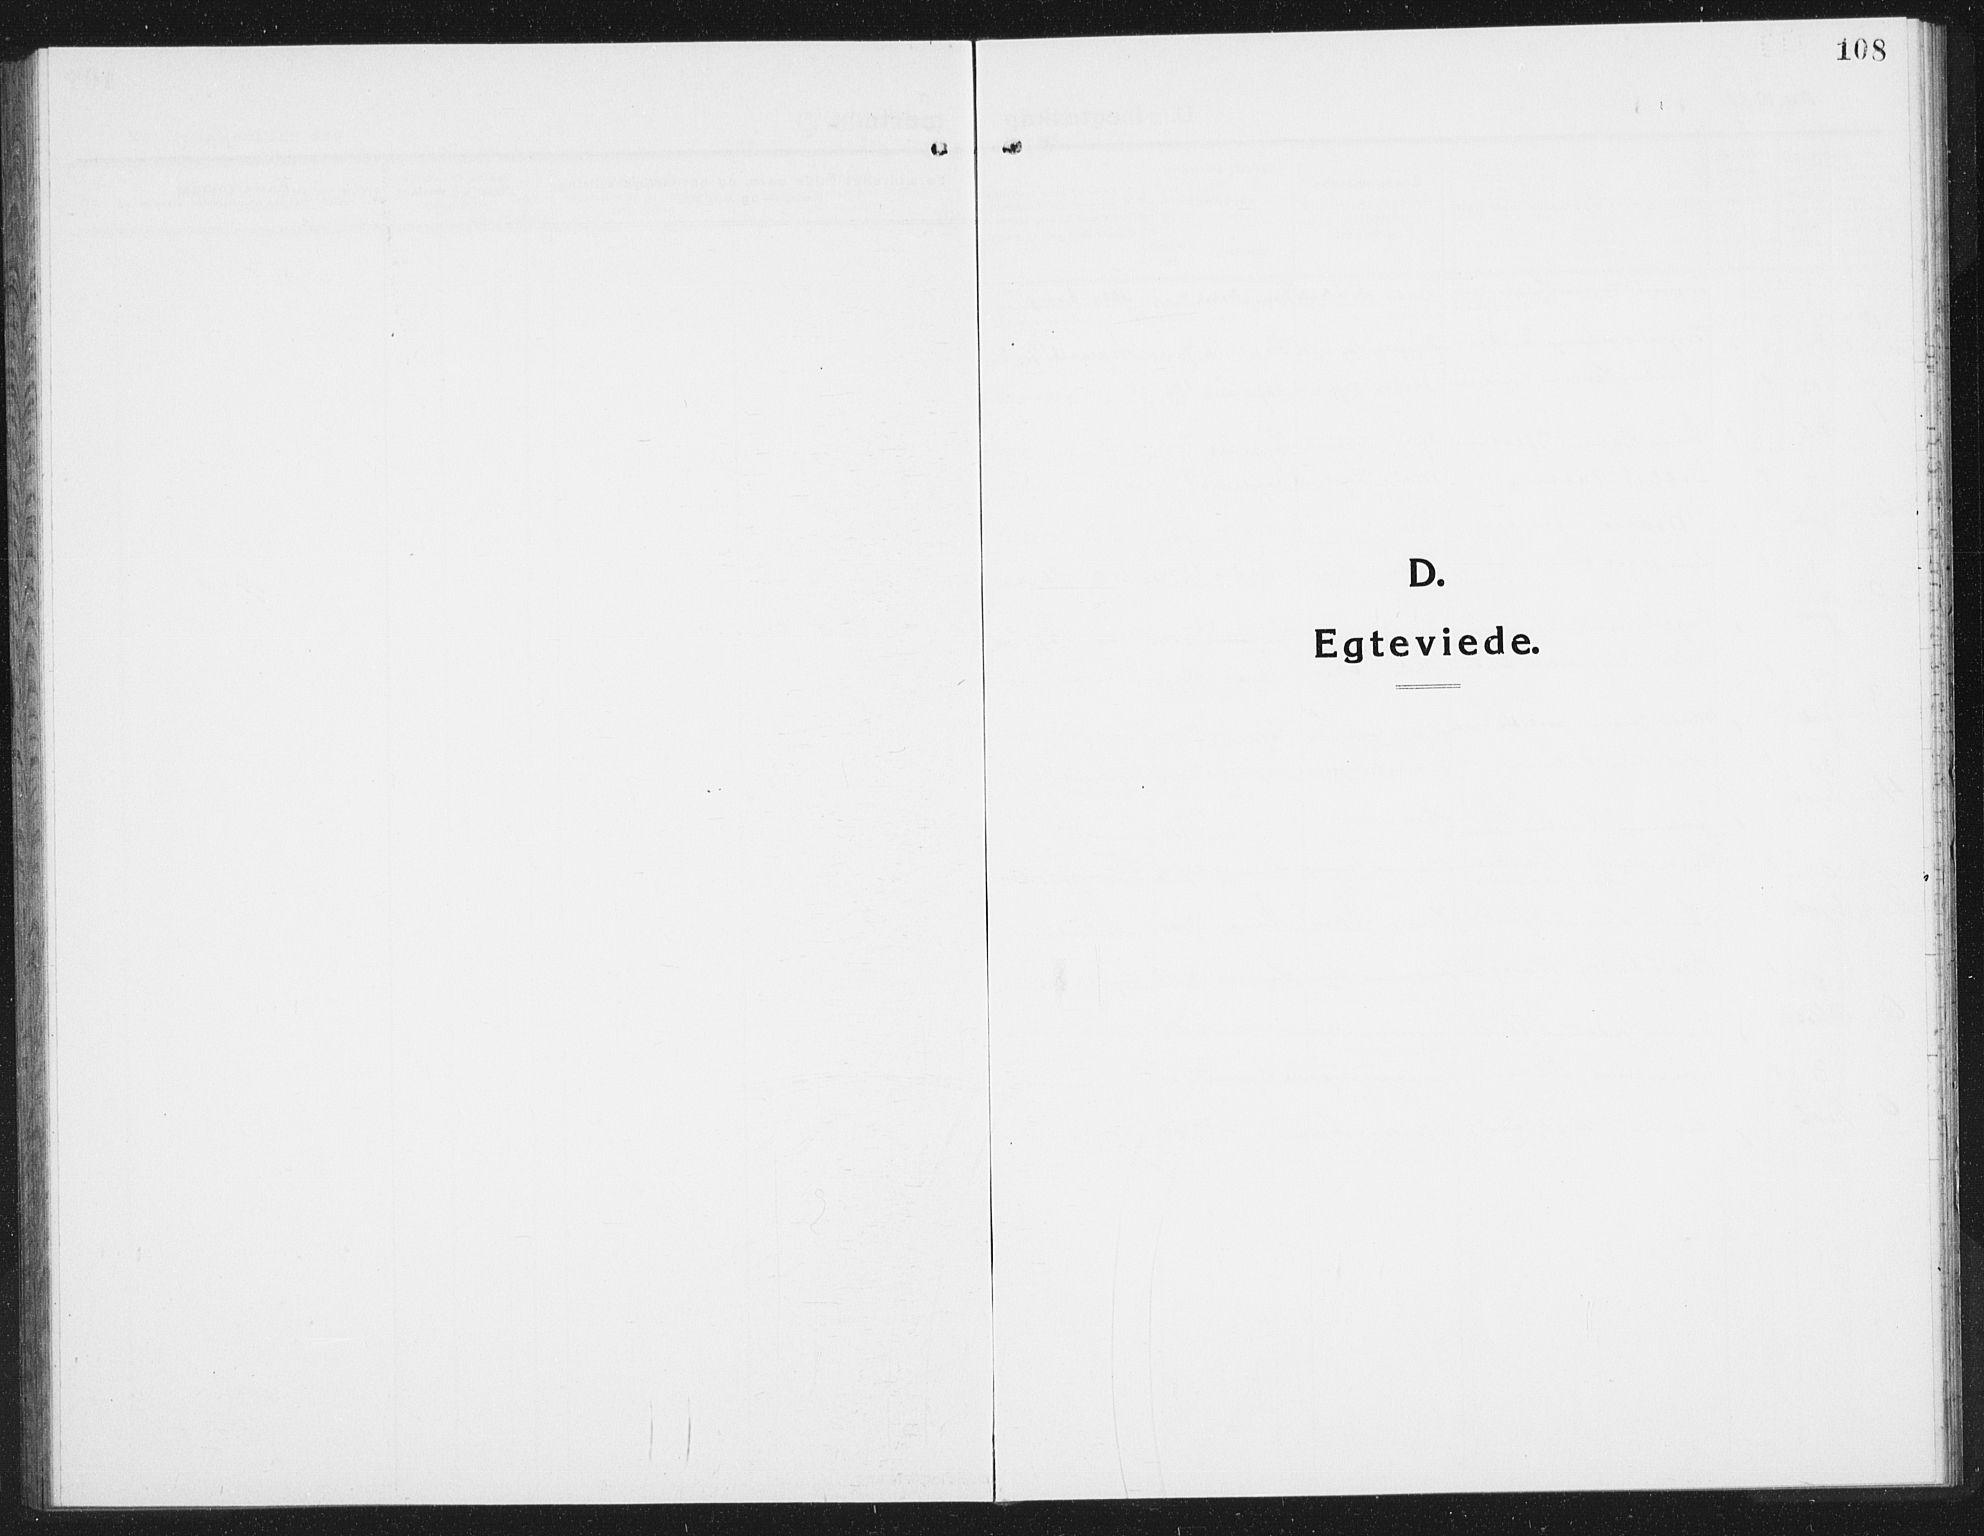 SAST, Kopervik sokneprestkontor, H/Ha/Hab/L0006: Klokkerbok nr. B 6, 1918-1942, s. 108